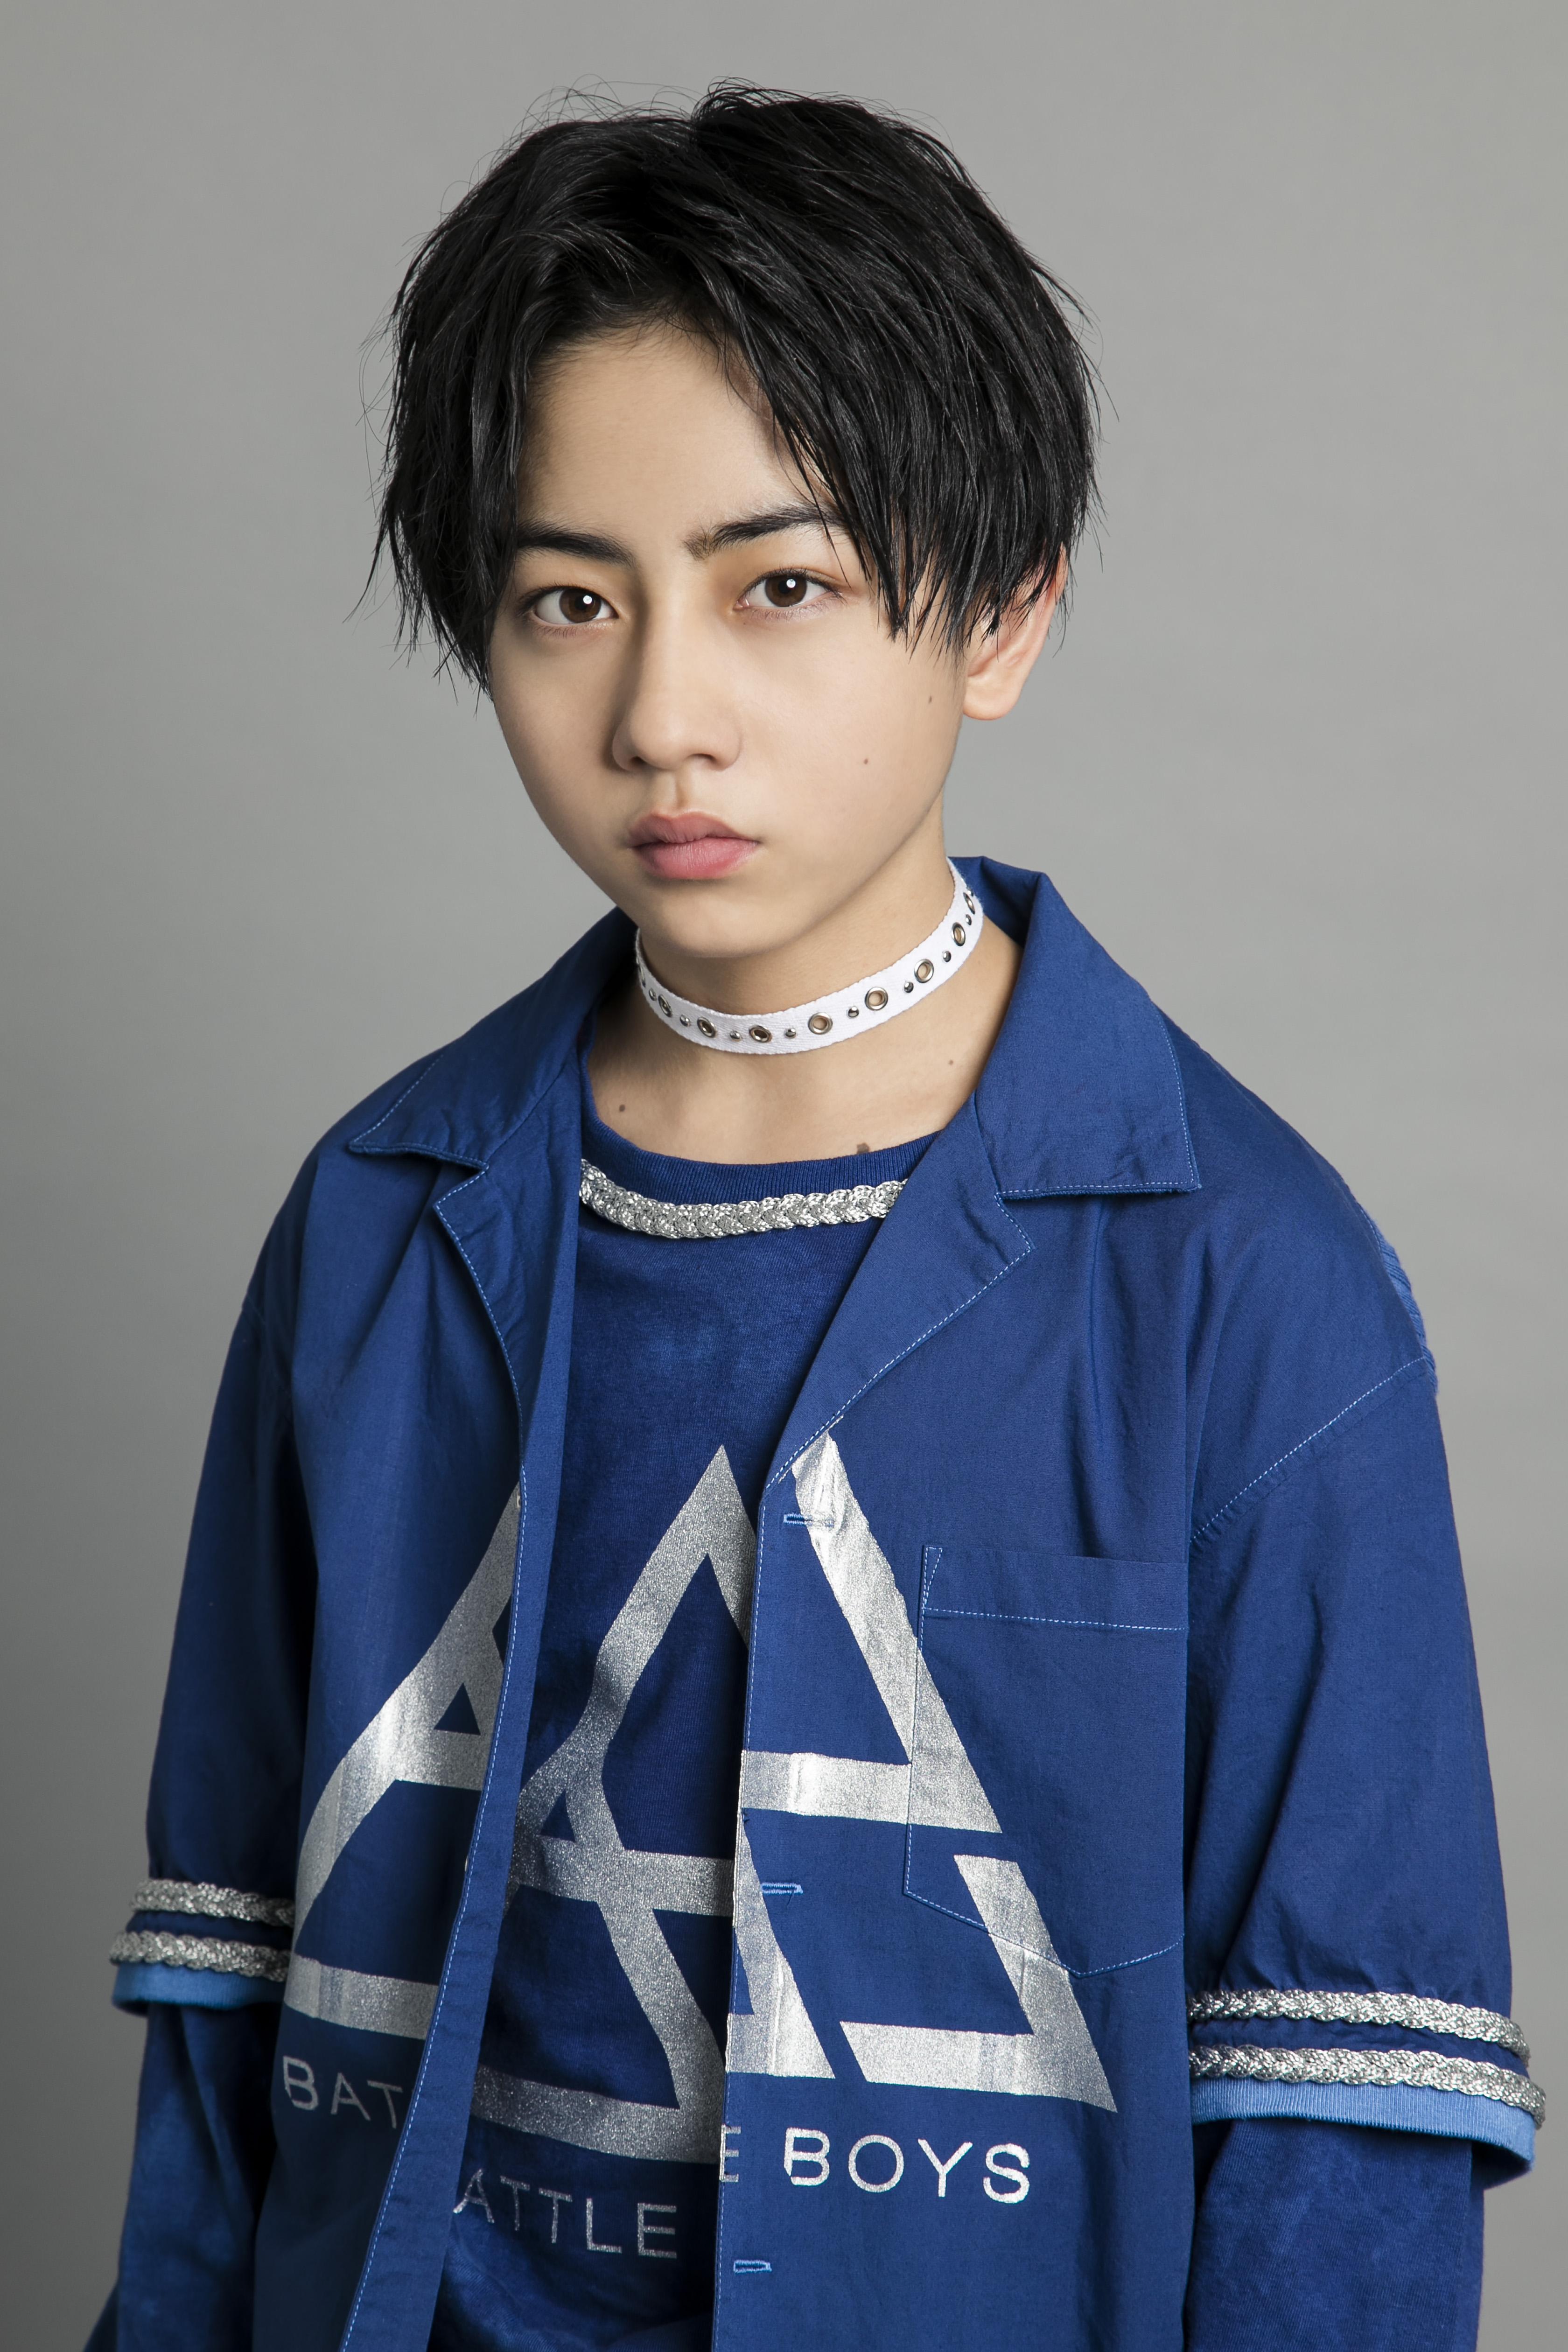 boobhoop imagesize:1280x1280$) EBiDAN OSAKA Yumiki Yamato (Check this link for his profile)